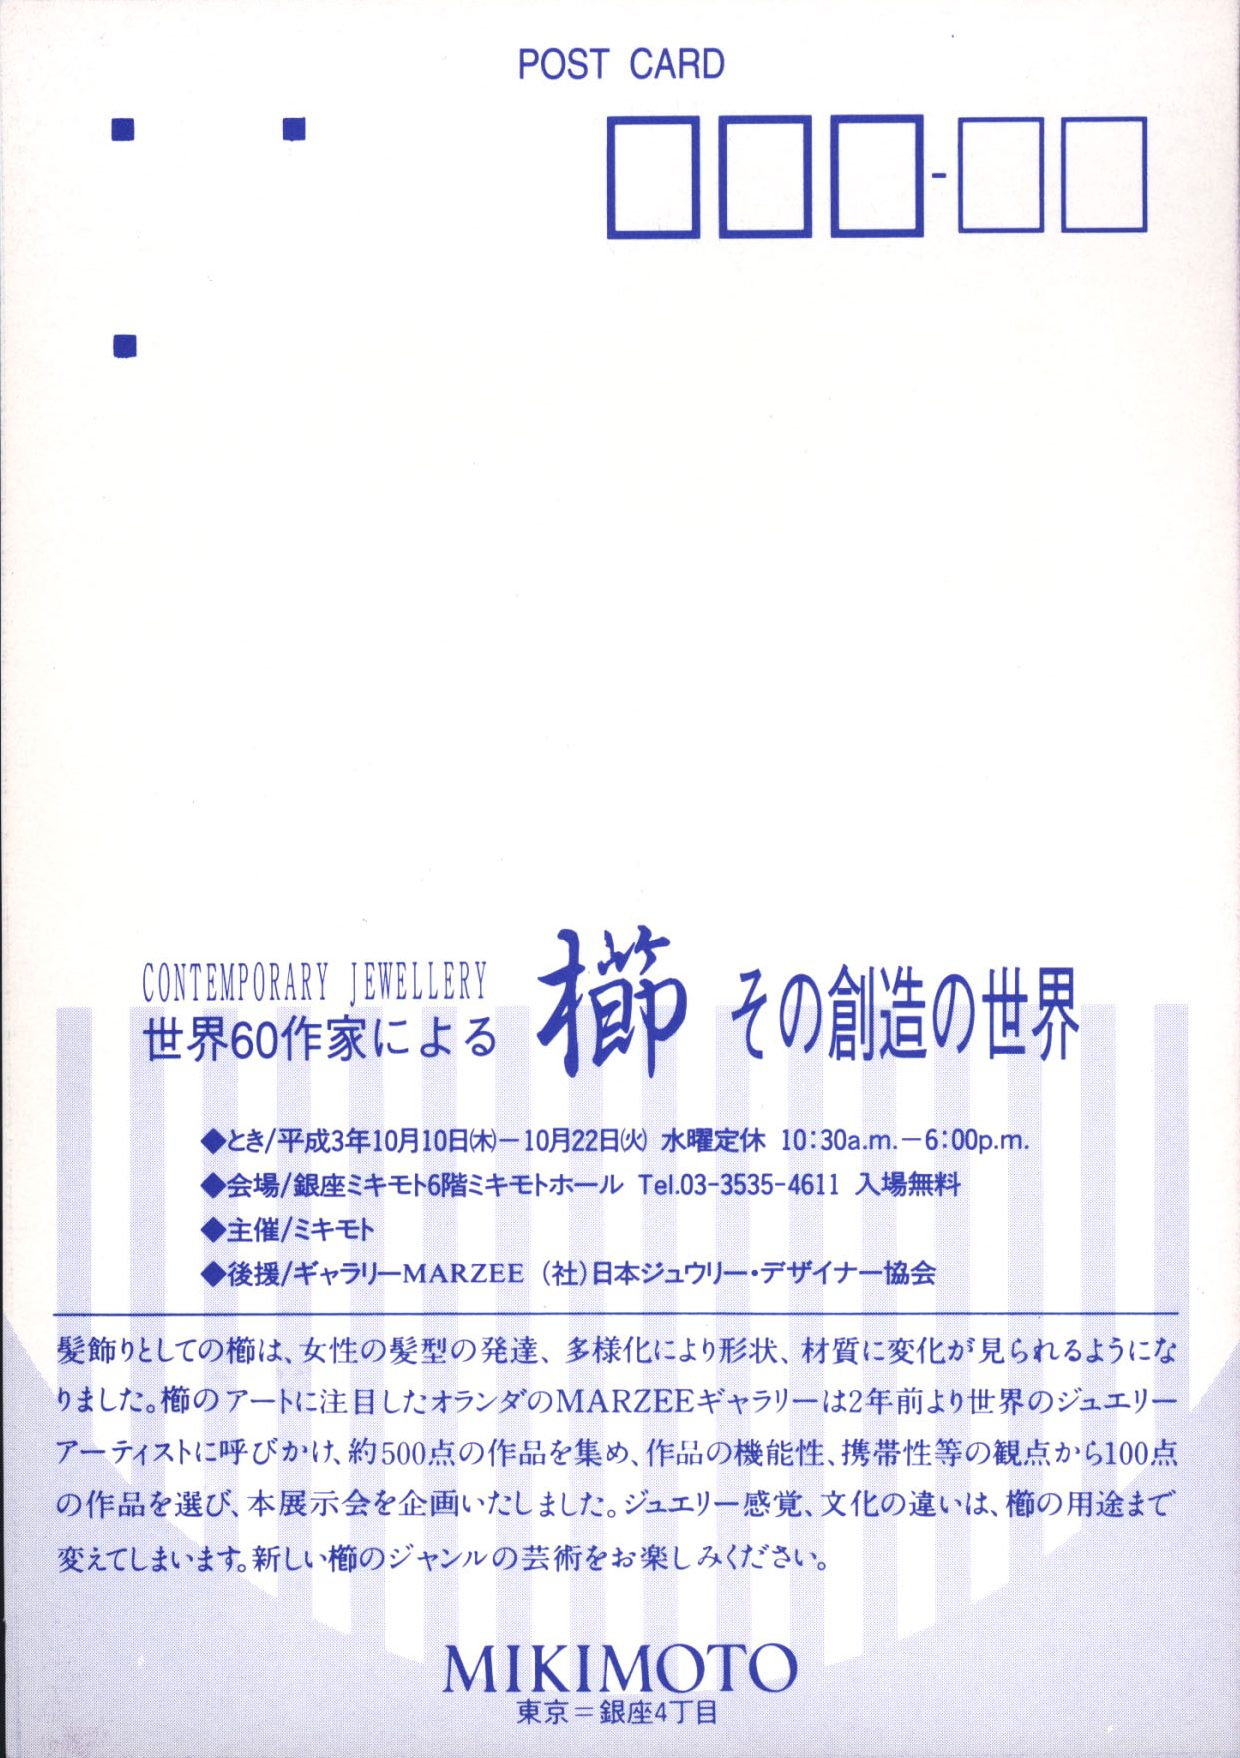 Uitnodiging Kammen, Galerie Marzee, Mikimoto, Japan, 1991, drukwerk, papier